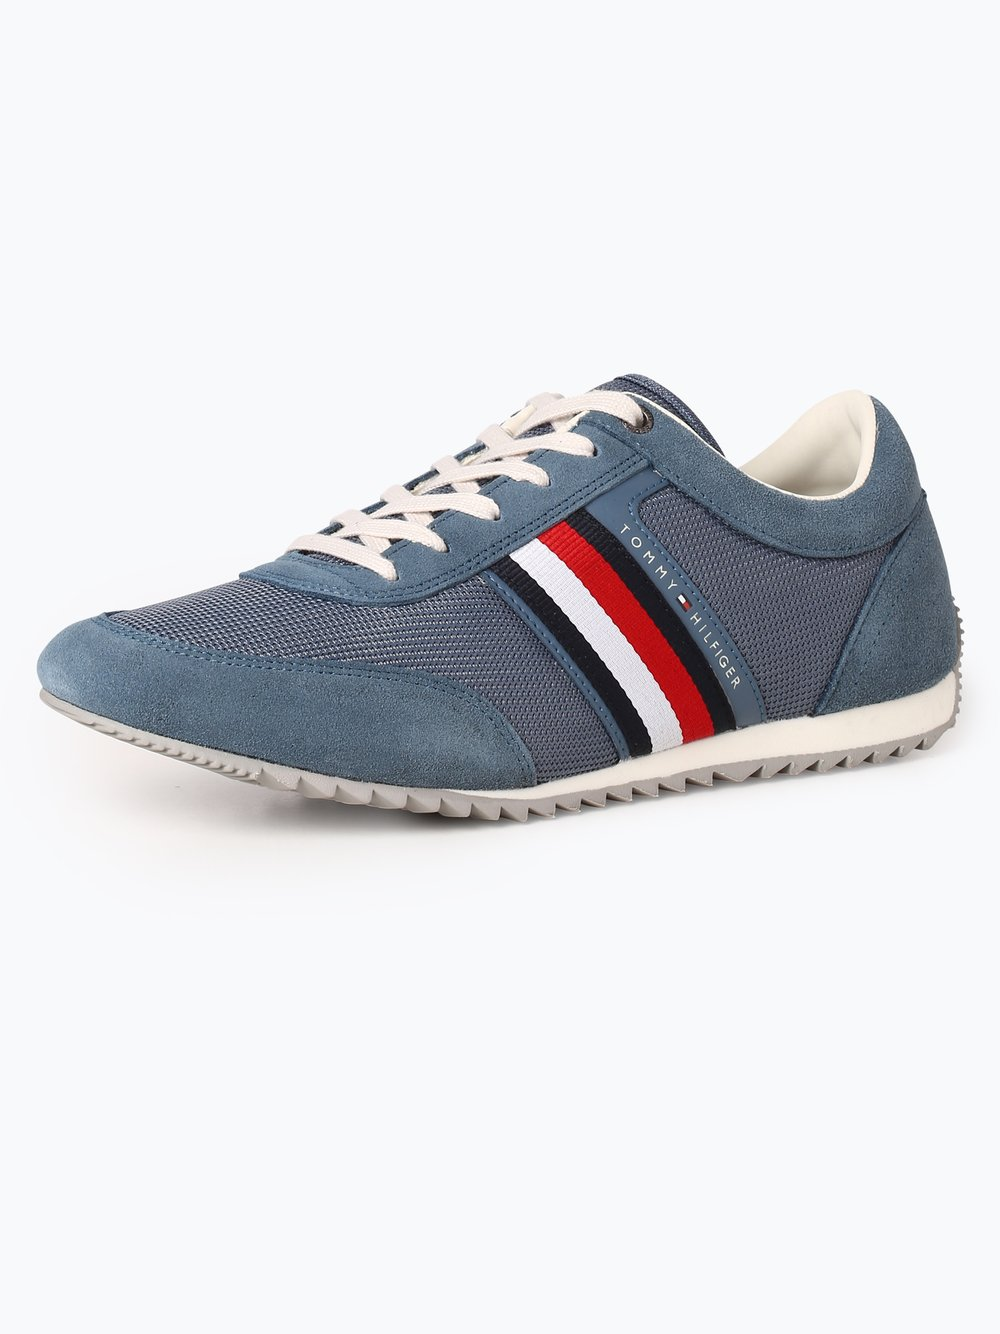 Tommy Hilfiger Herren Sneaker mit Leder-Anteil indigo uni online ... e17236d102